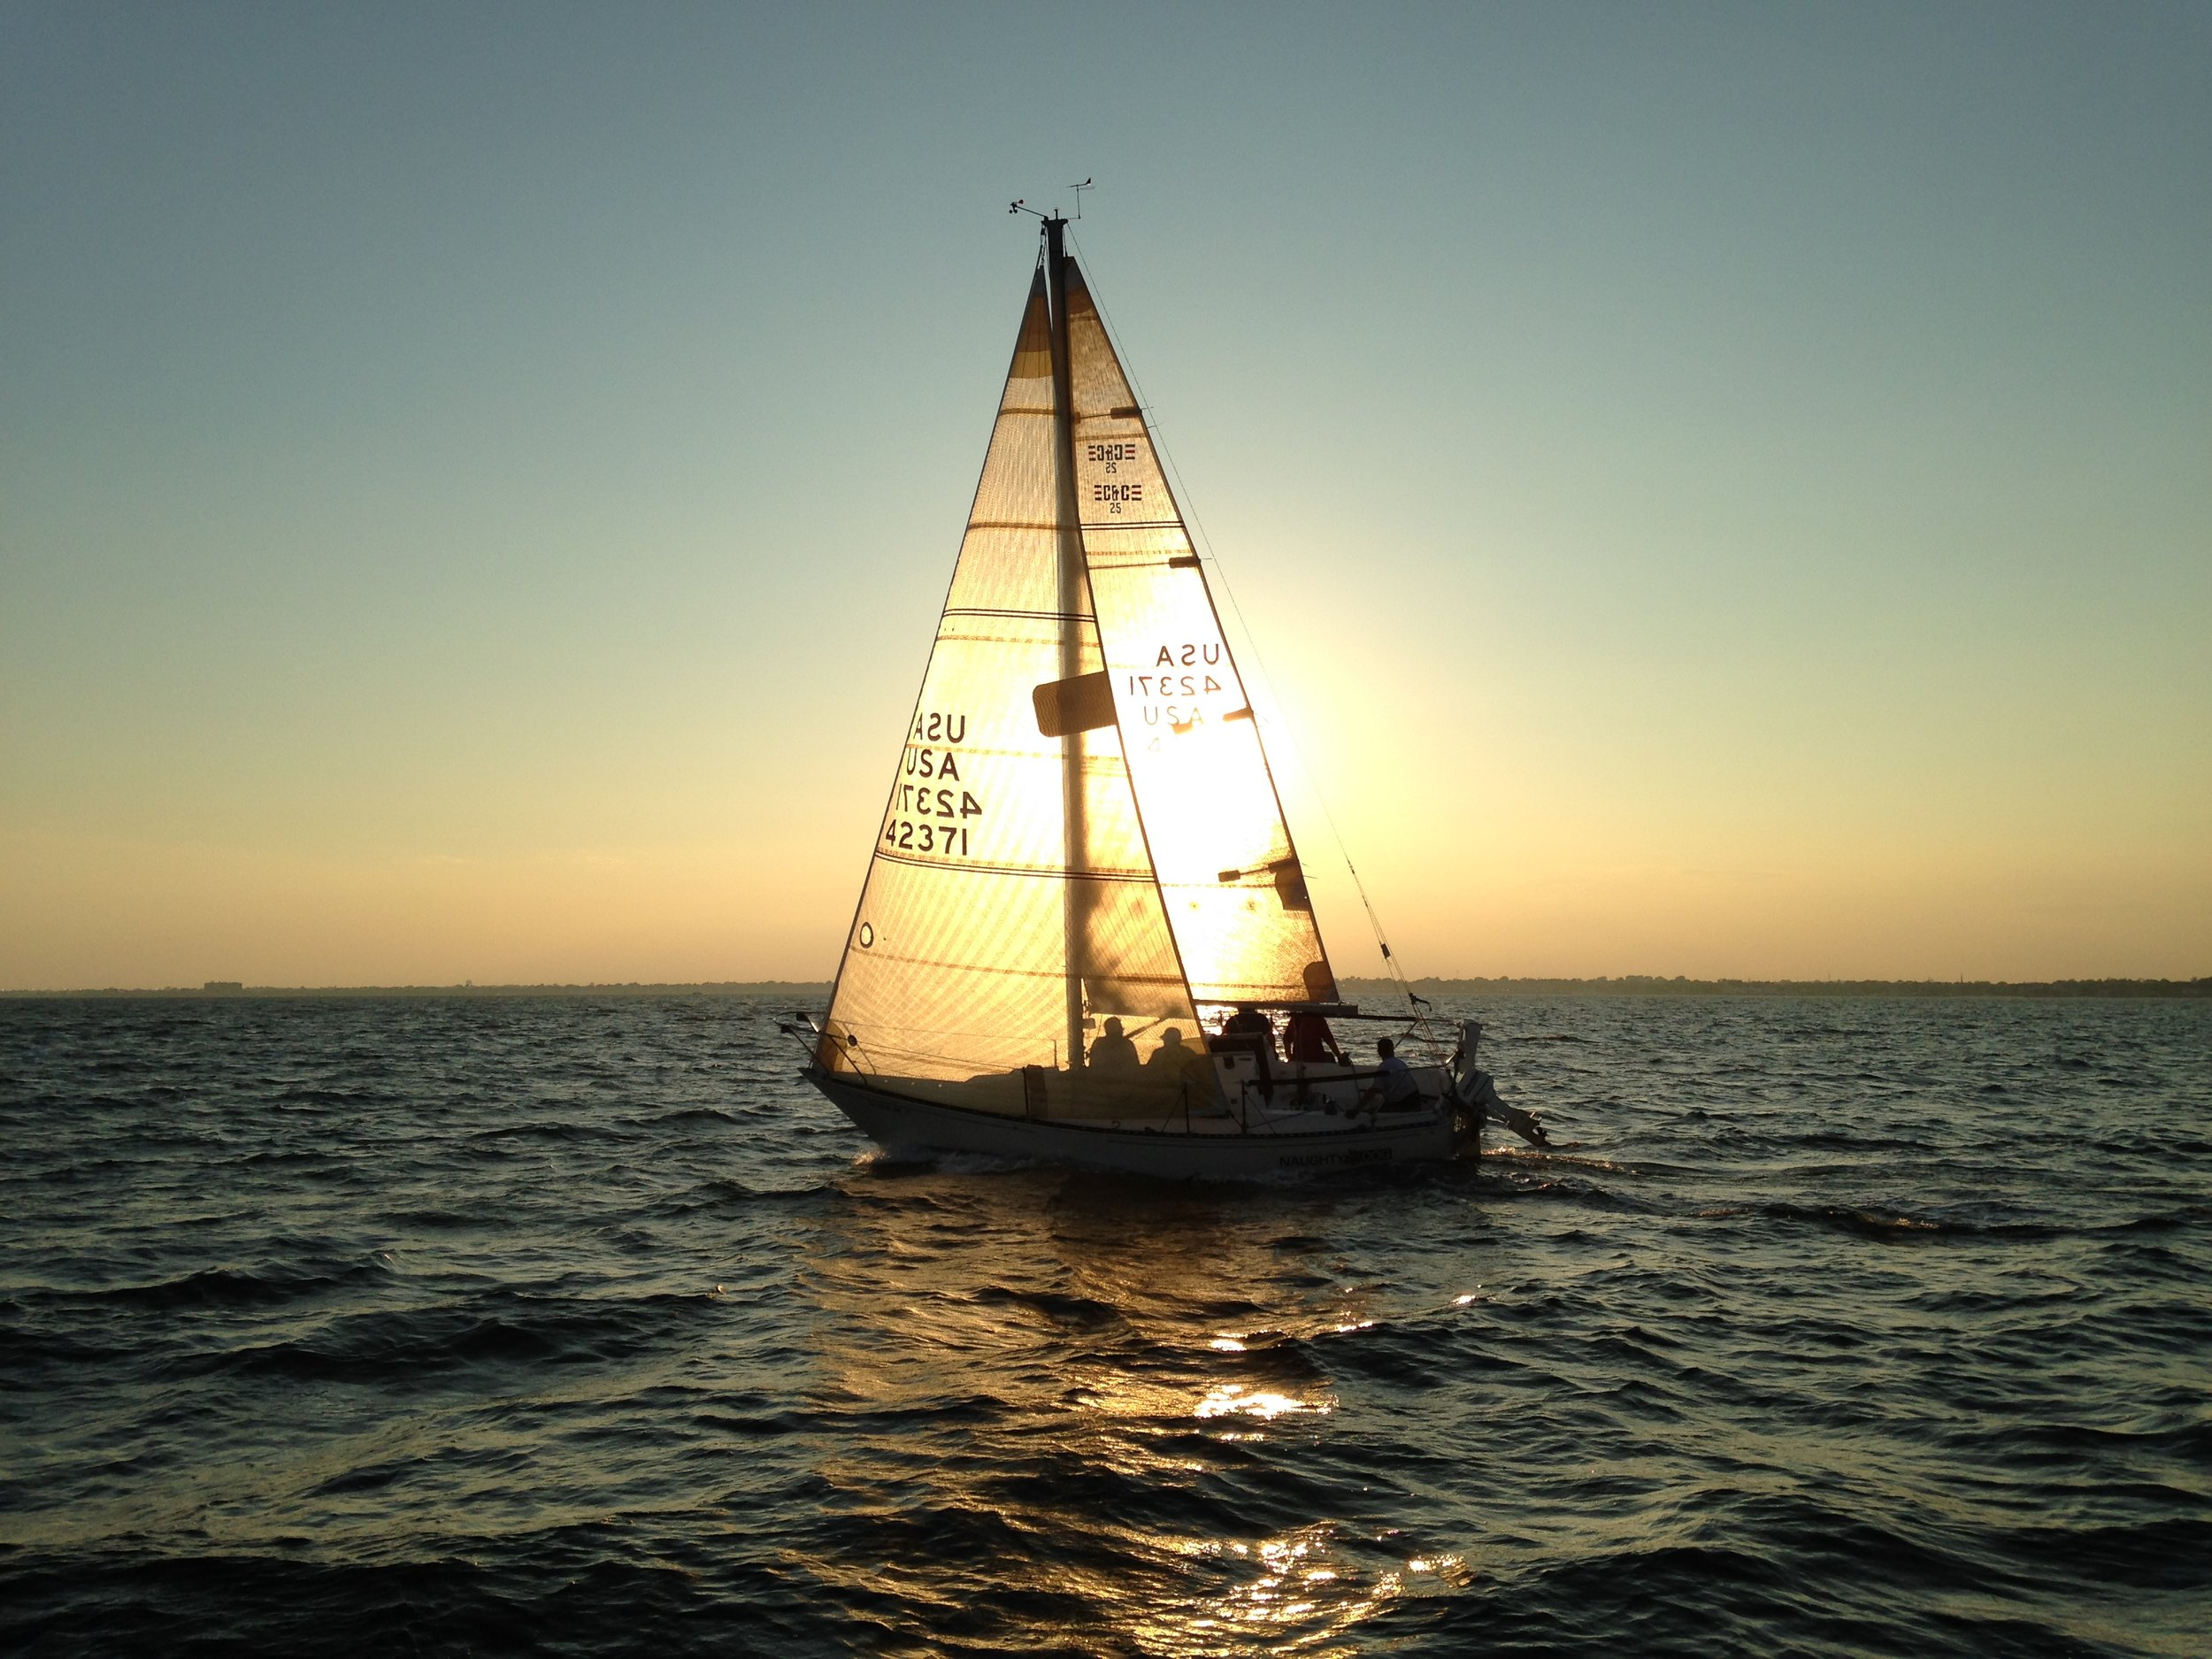 Sailing lessons at Half Term